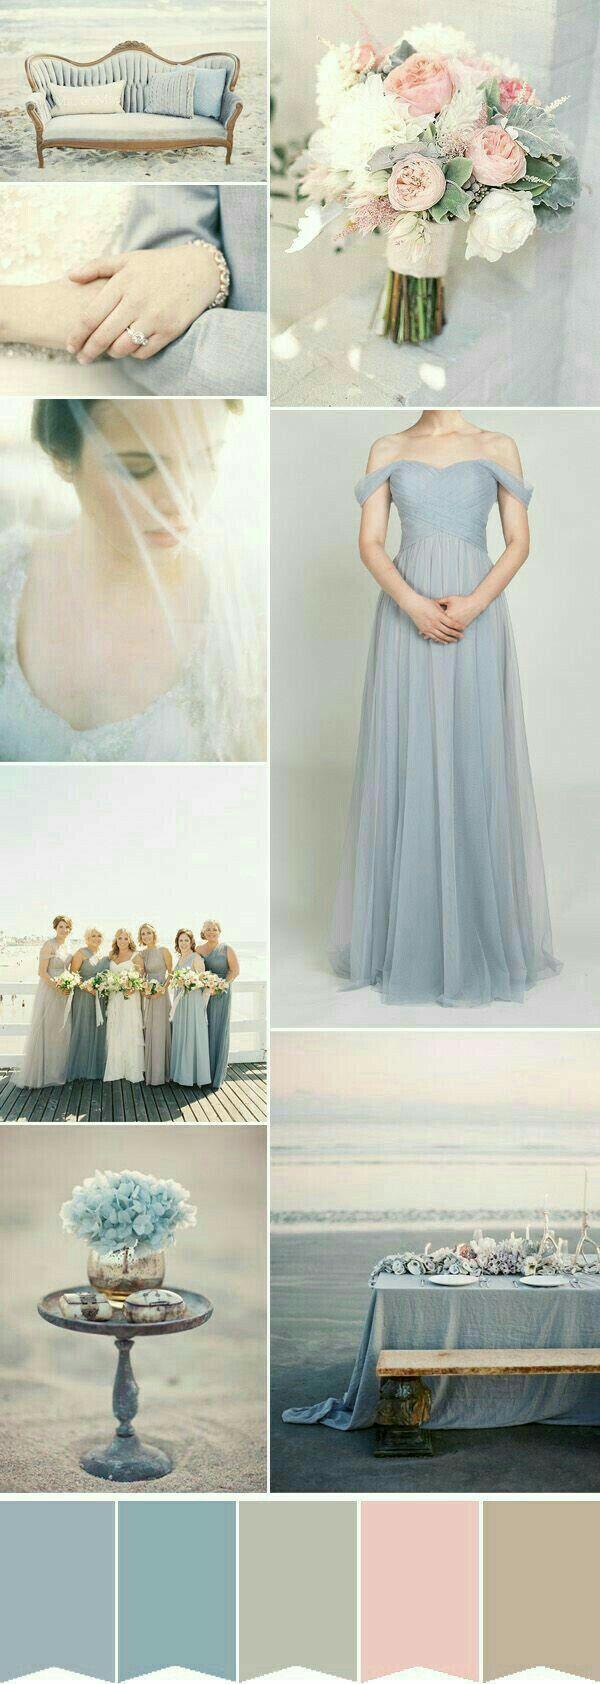 Top 10 wedding decorations november 2018 Love the delicate colors  Weddings  Pinterest  Delicate Wedding